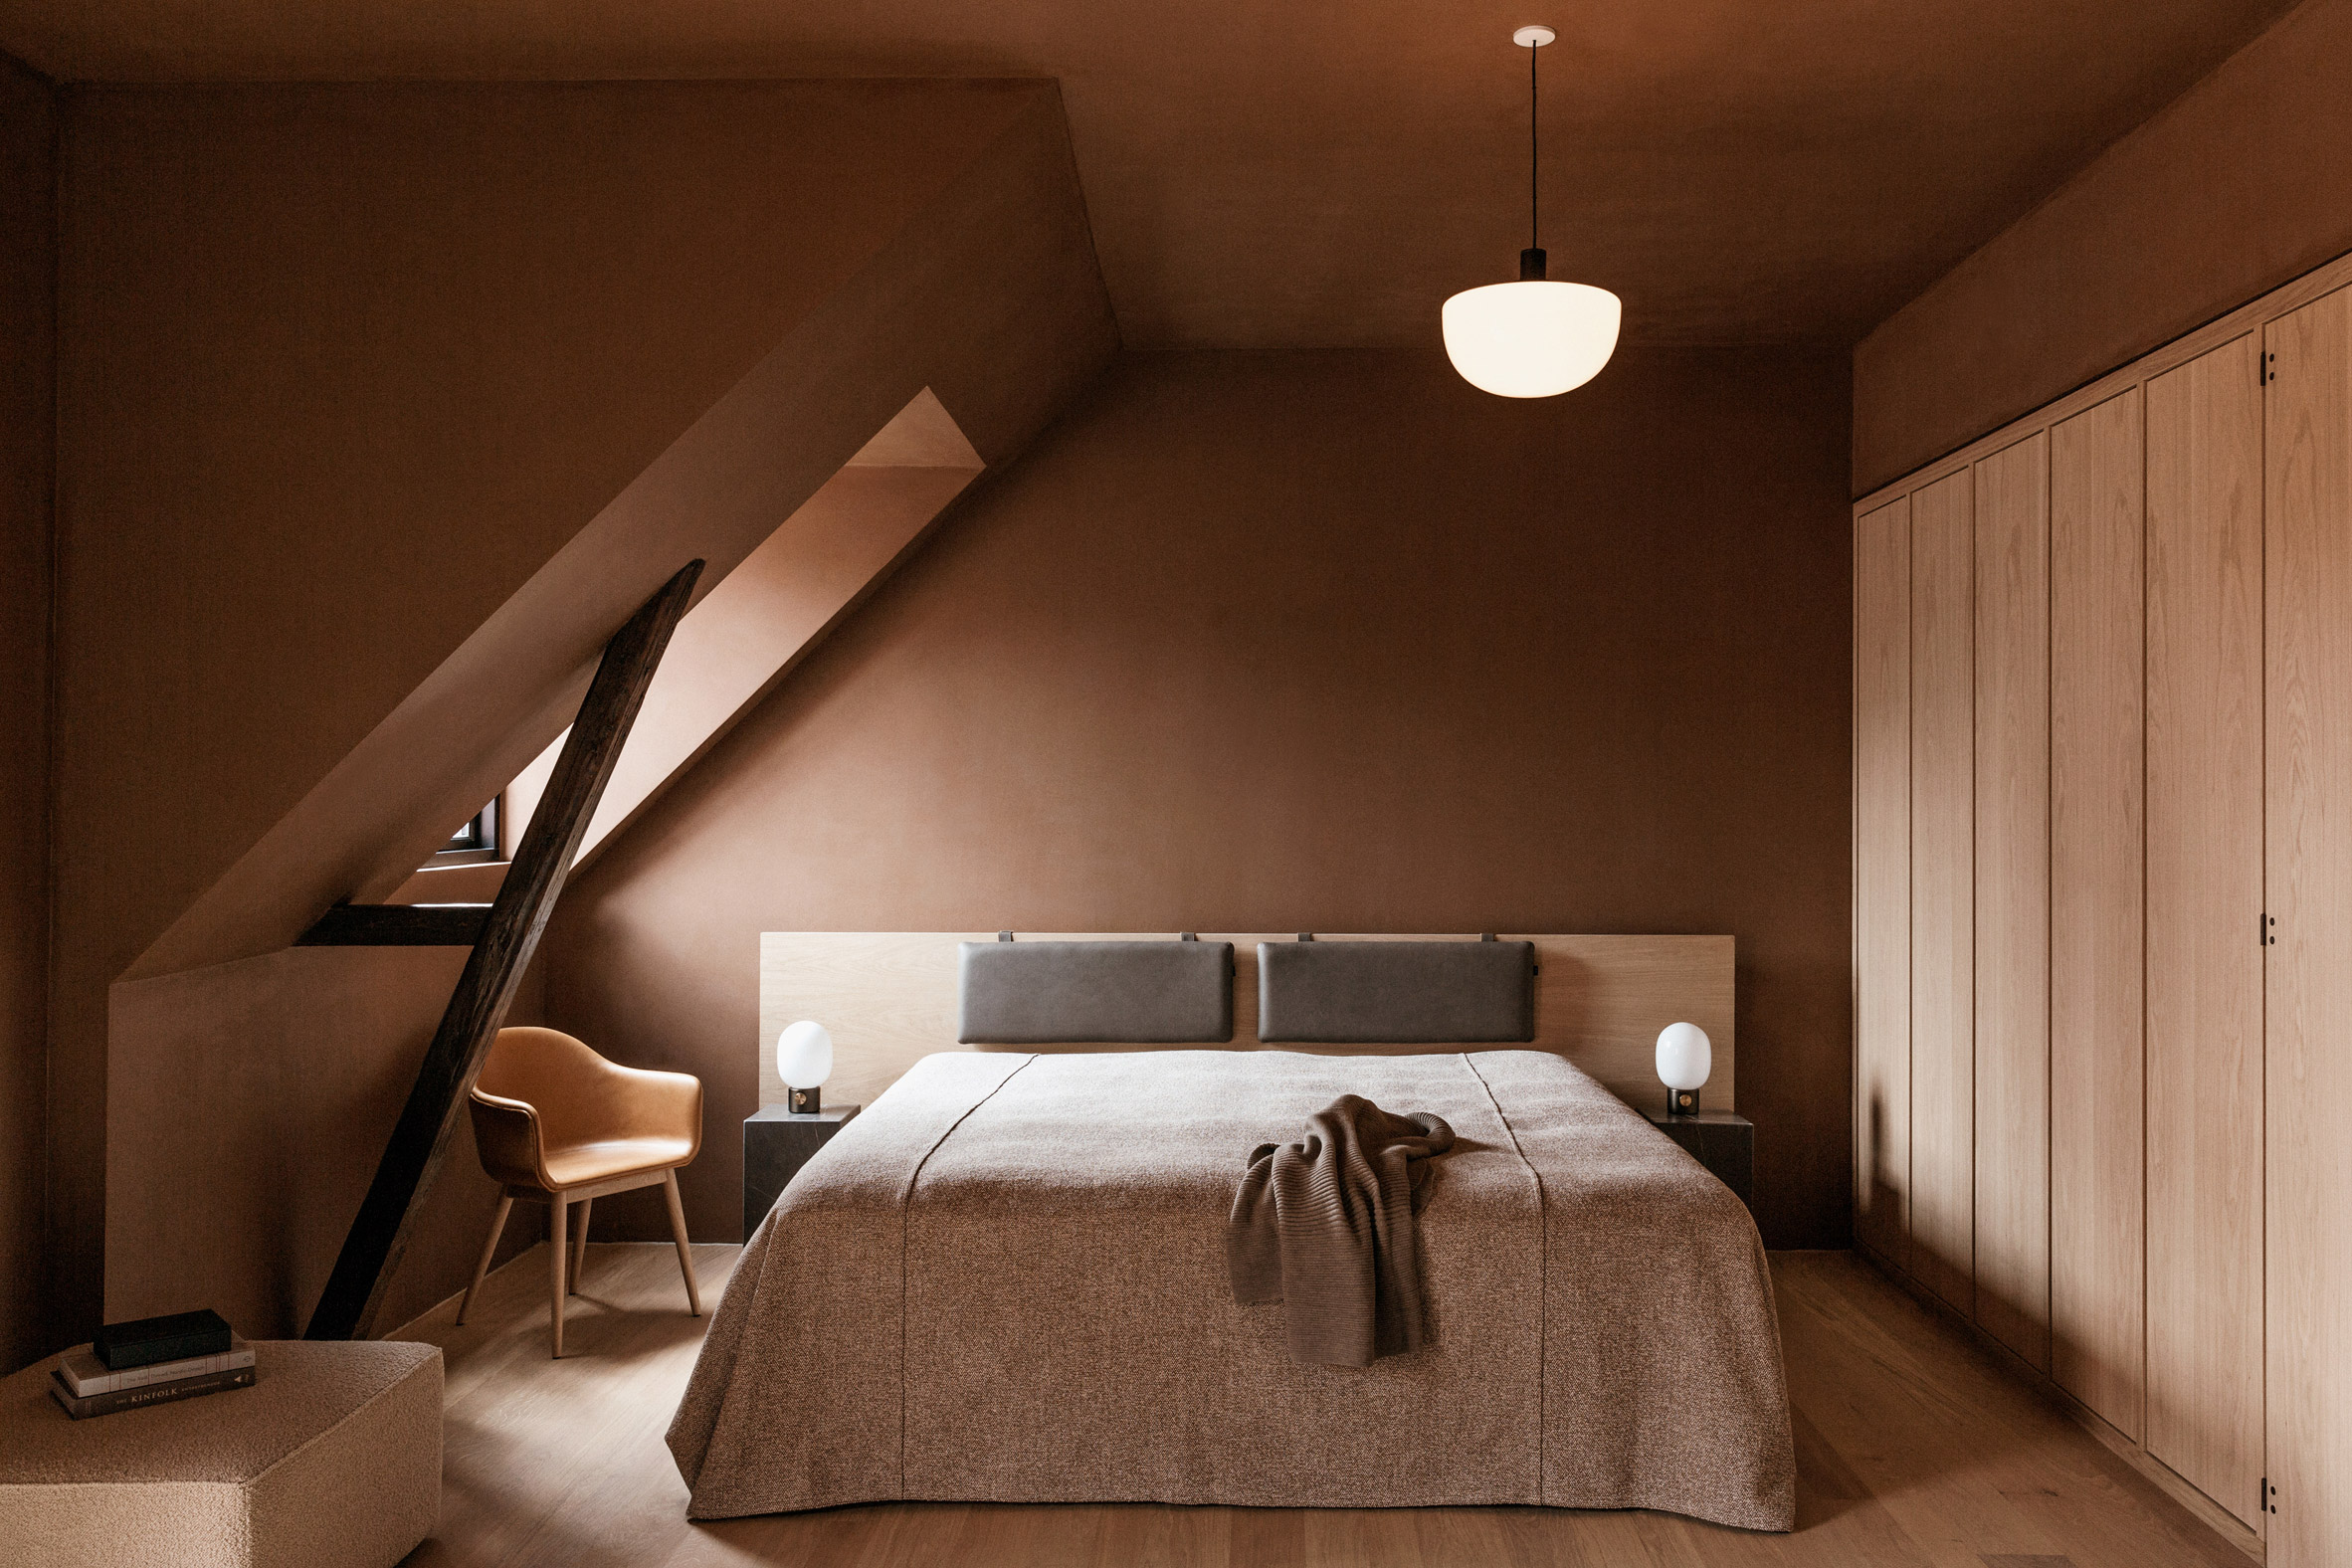 Design hotel in Copenhagen, Menu furniture, by Norm Architects.